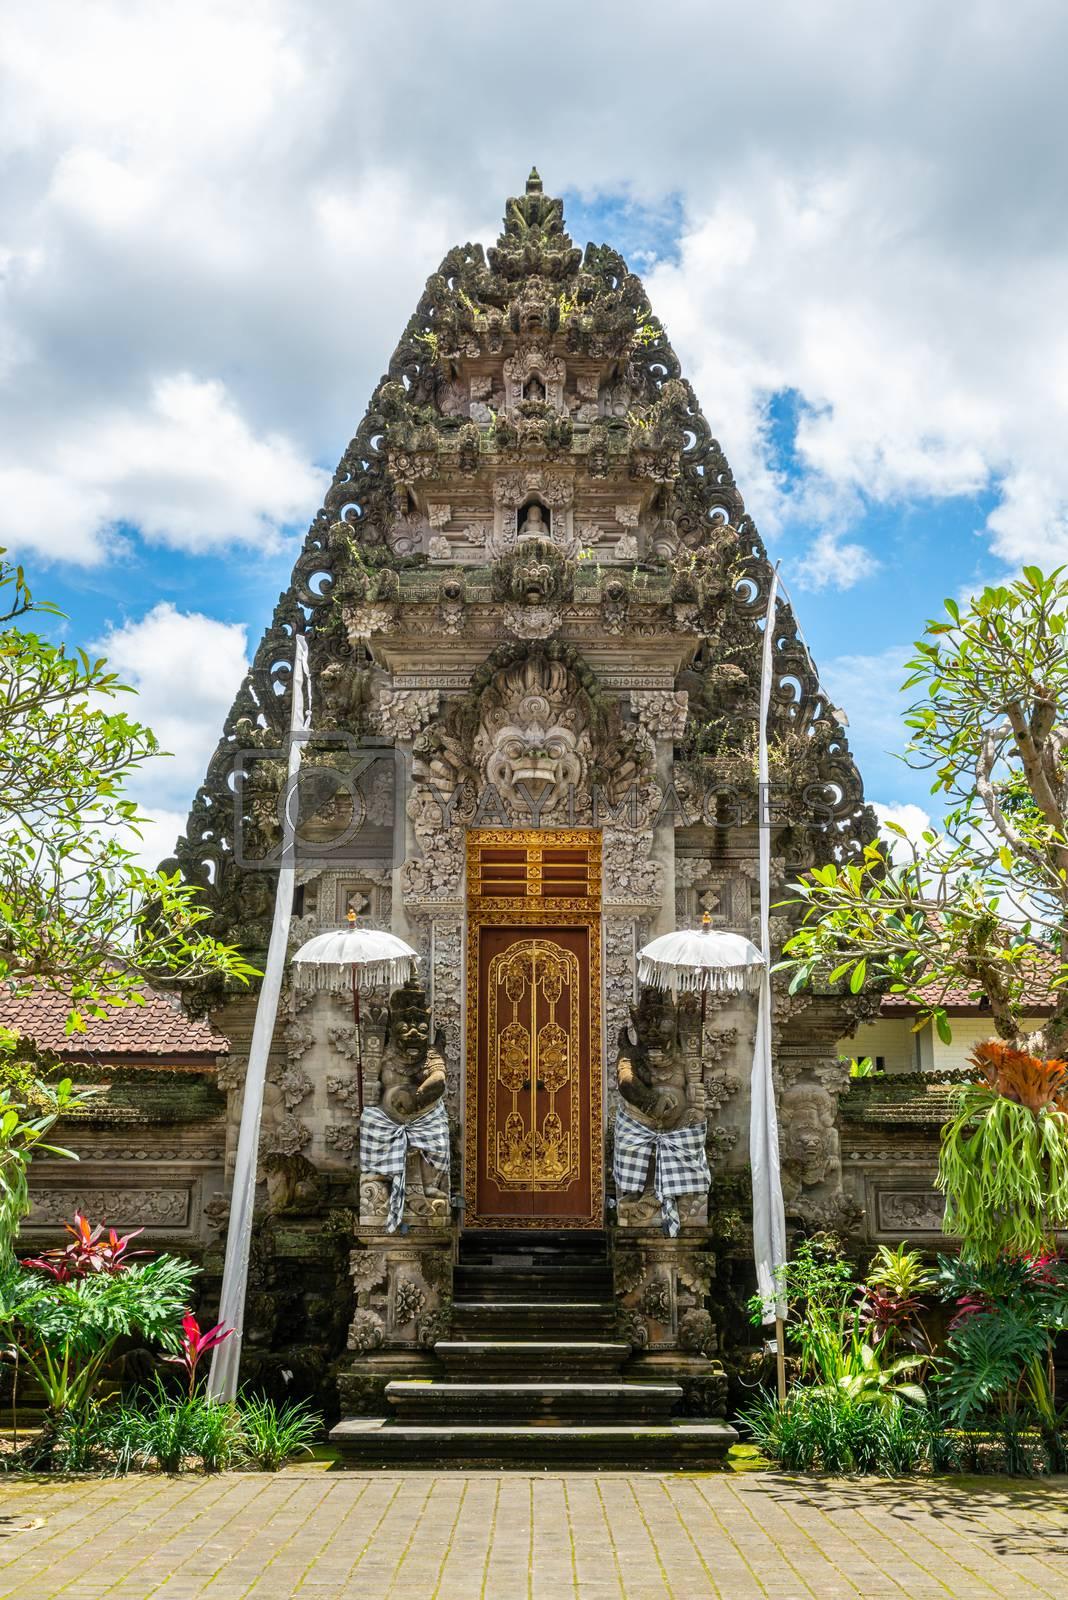 Puri Kantor Hindu temple in Ubud, Bali, Indonesia